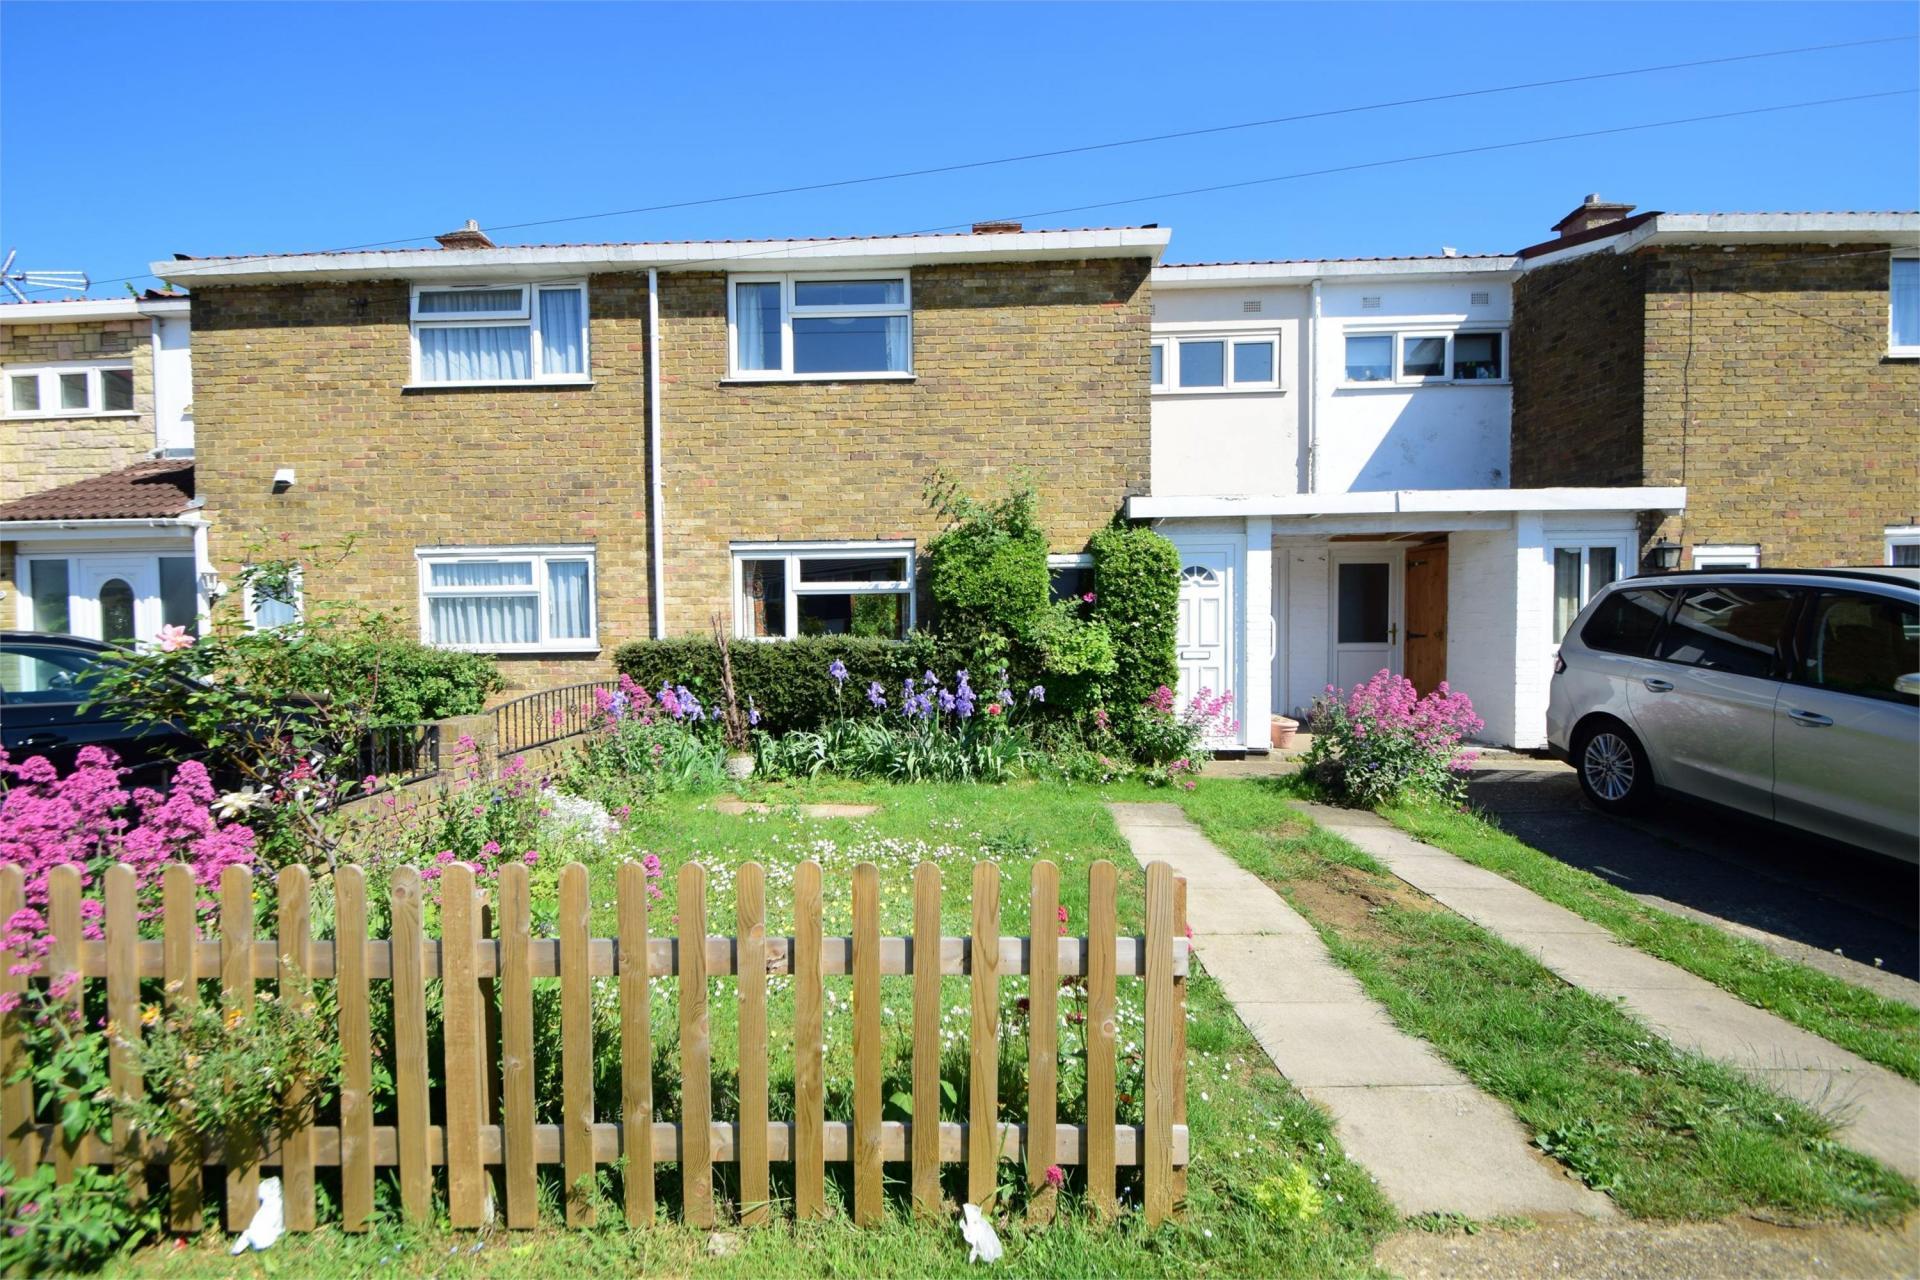 Property On Sale In Stevenage